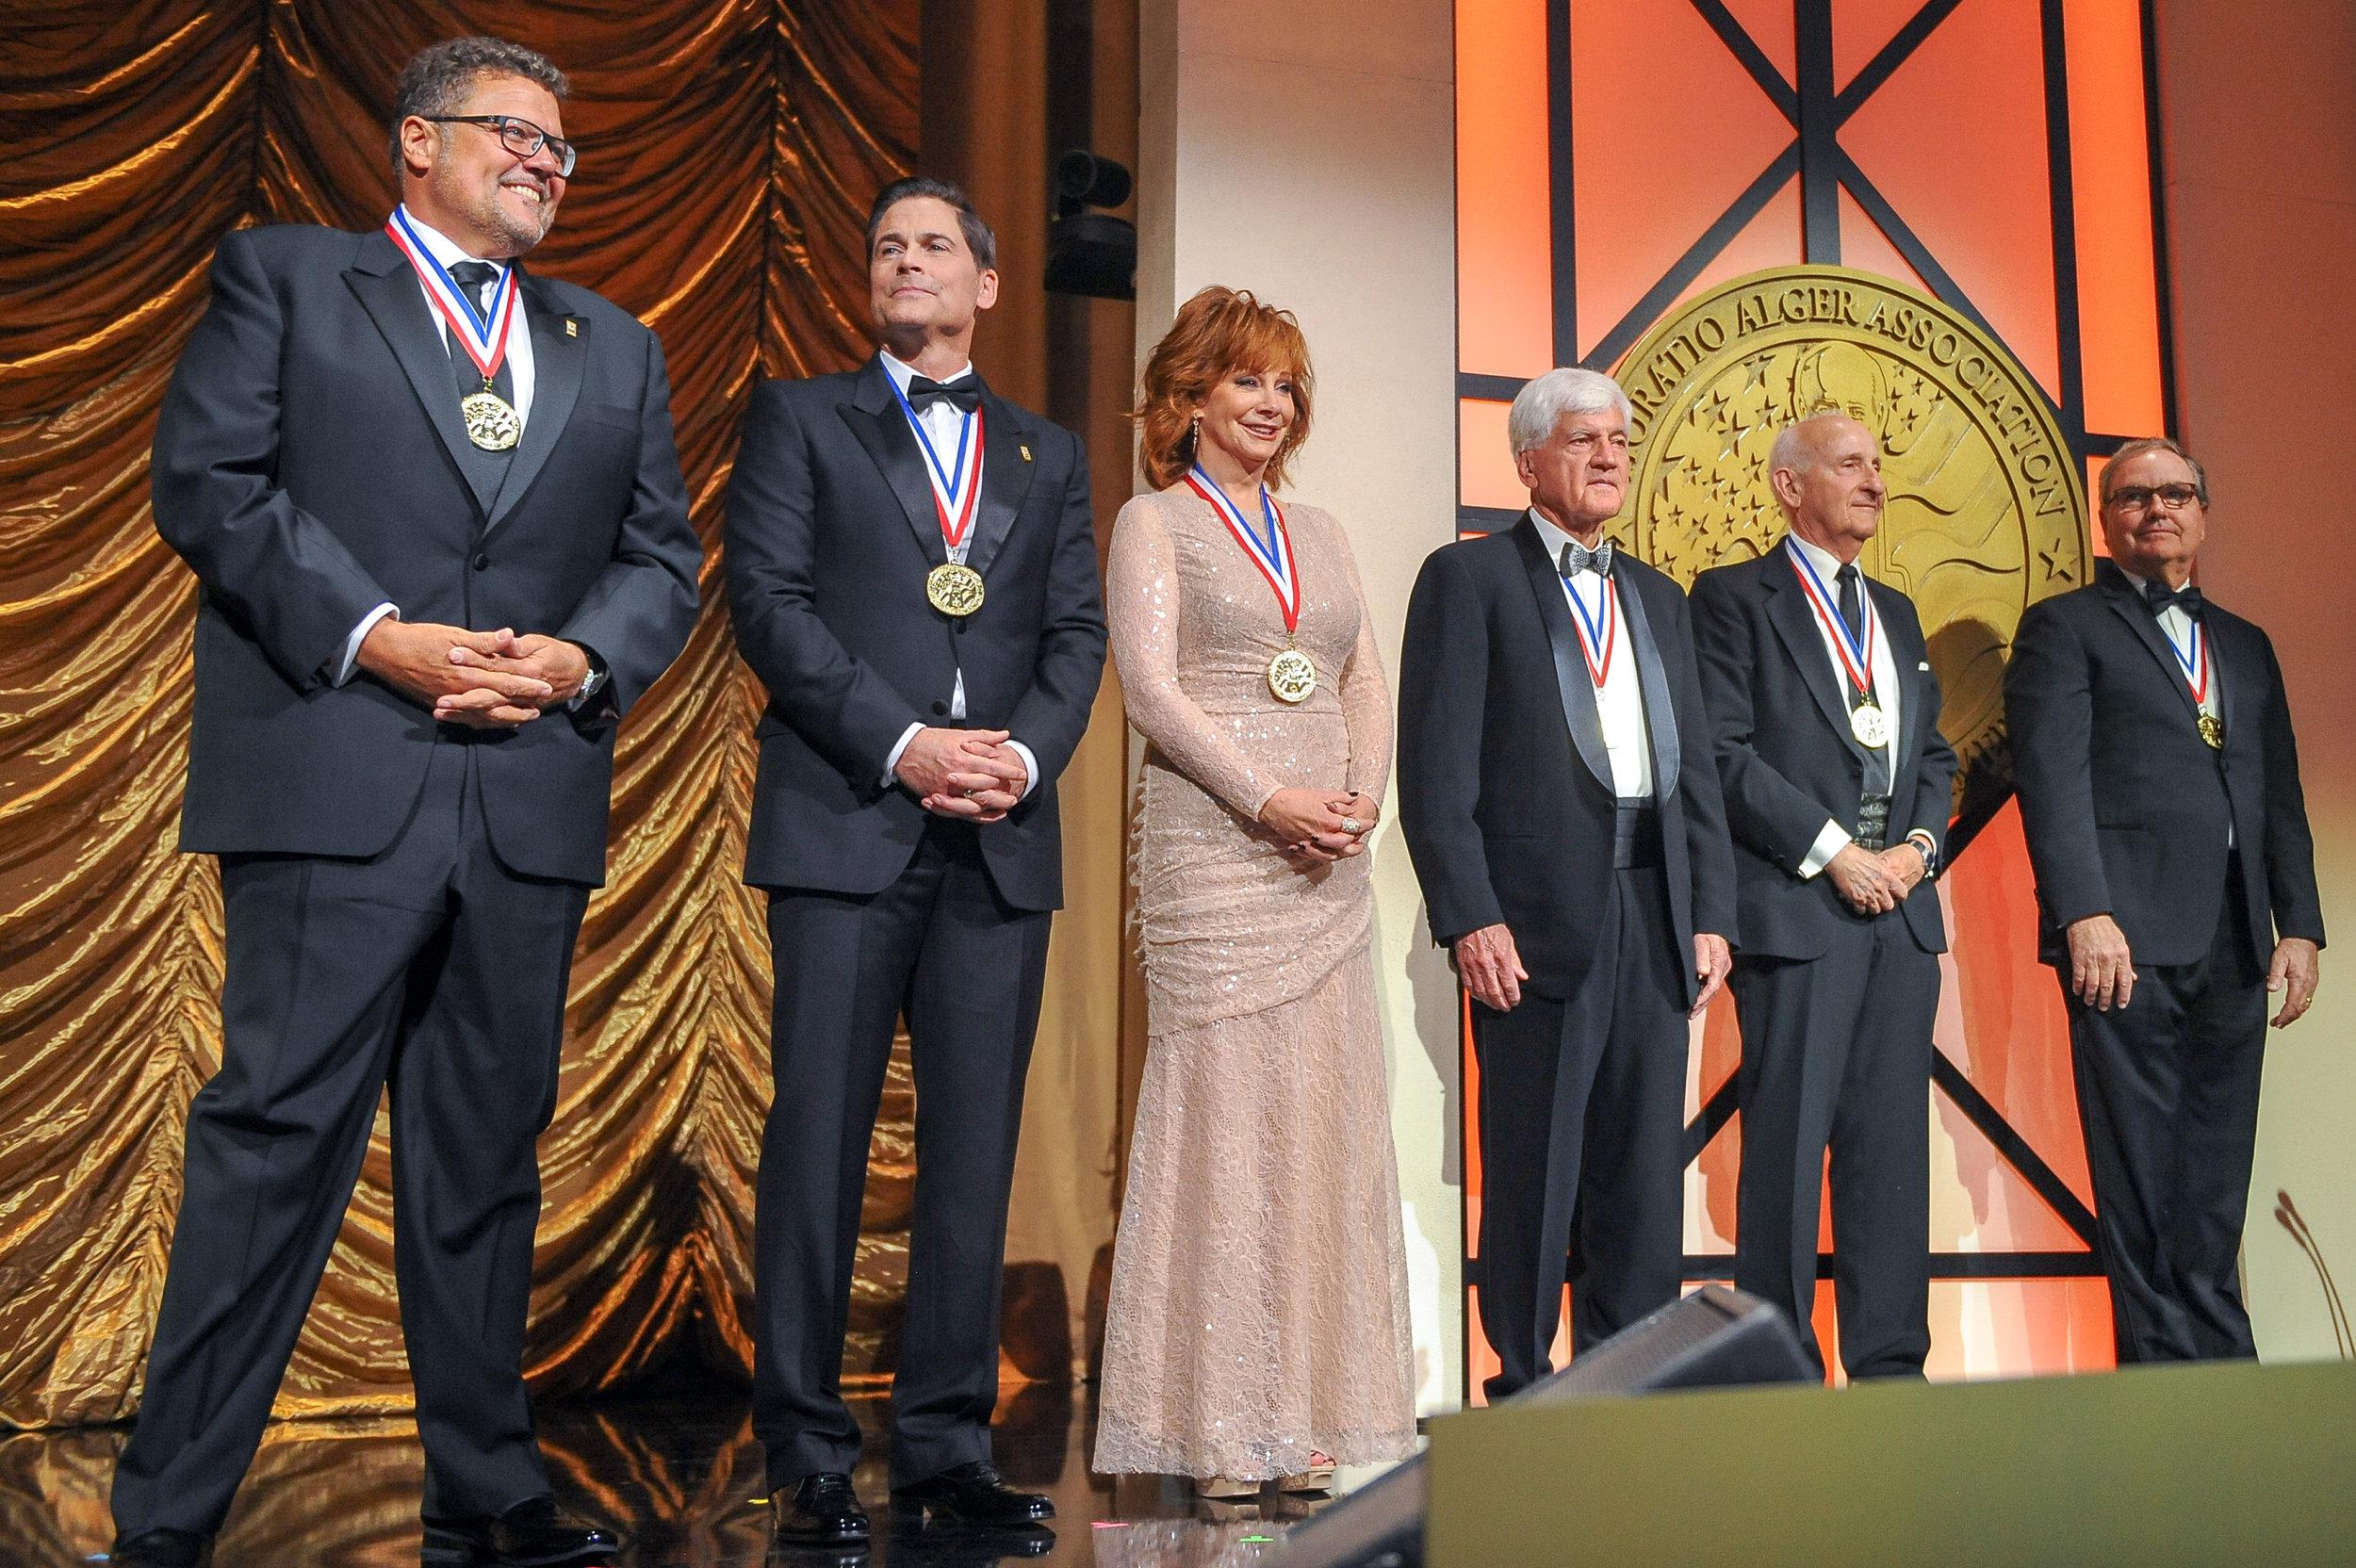 Horatio Alger Award